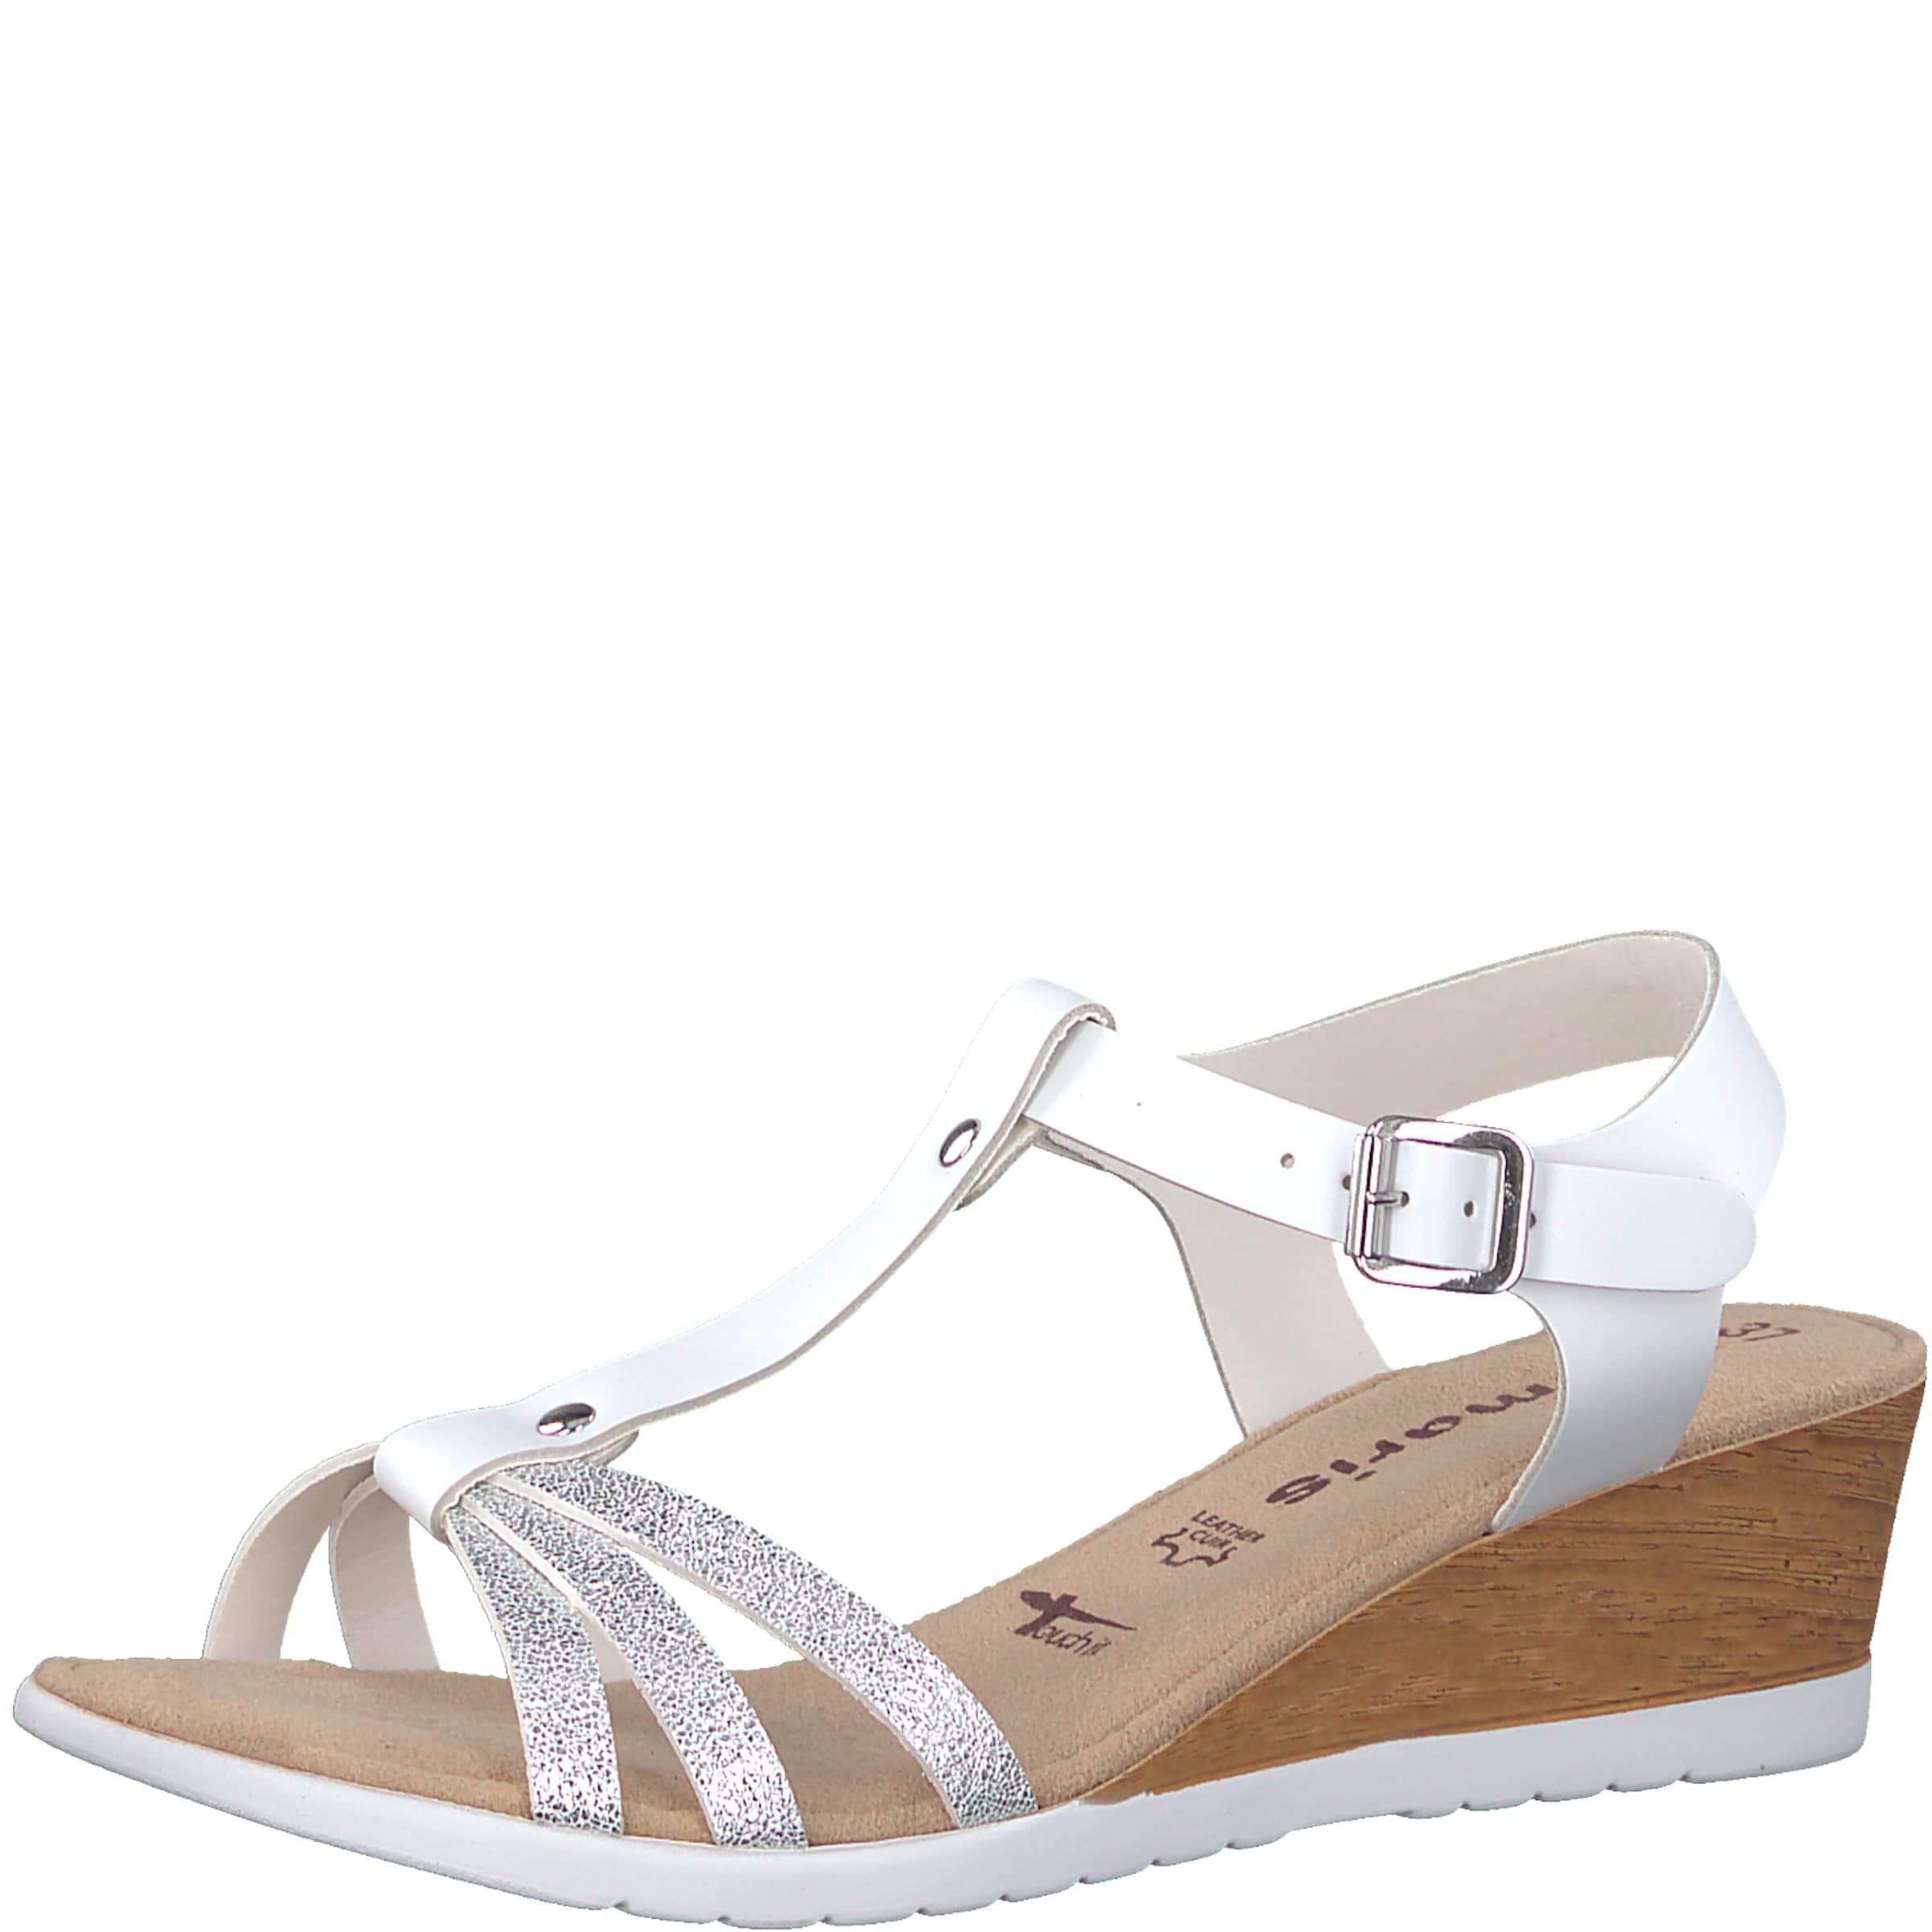 TAMARIS | Sandale 'Medium Sandal Glitter' Glitter' Sandal Schuhe Gut getragene Schuhe c30454